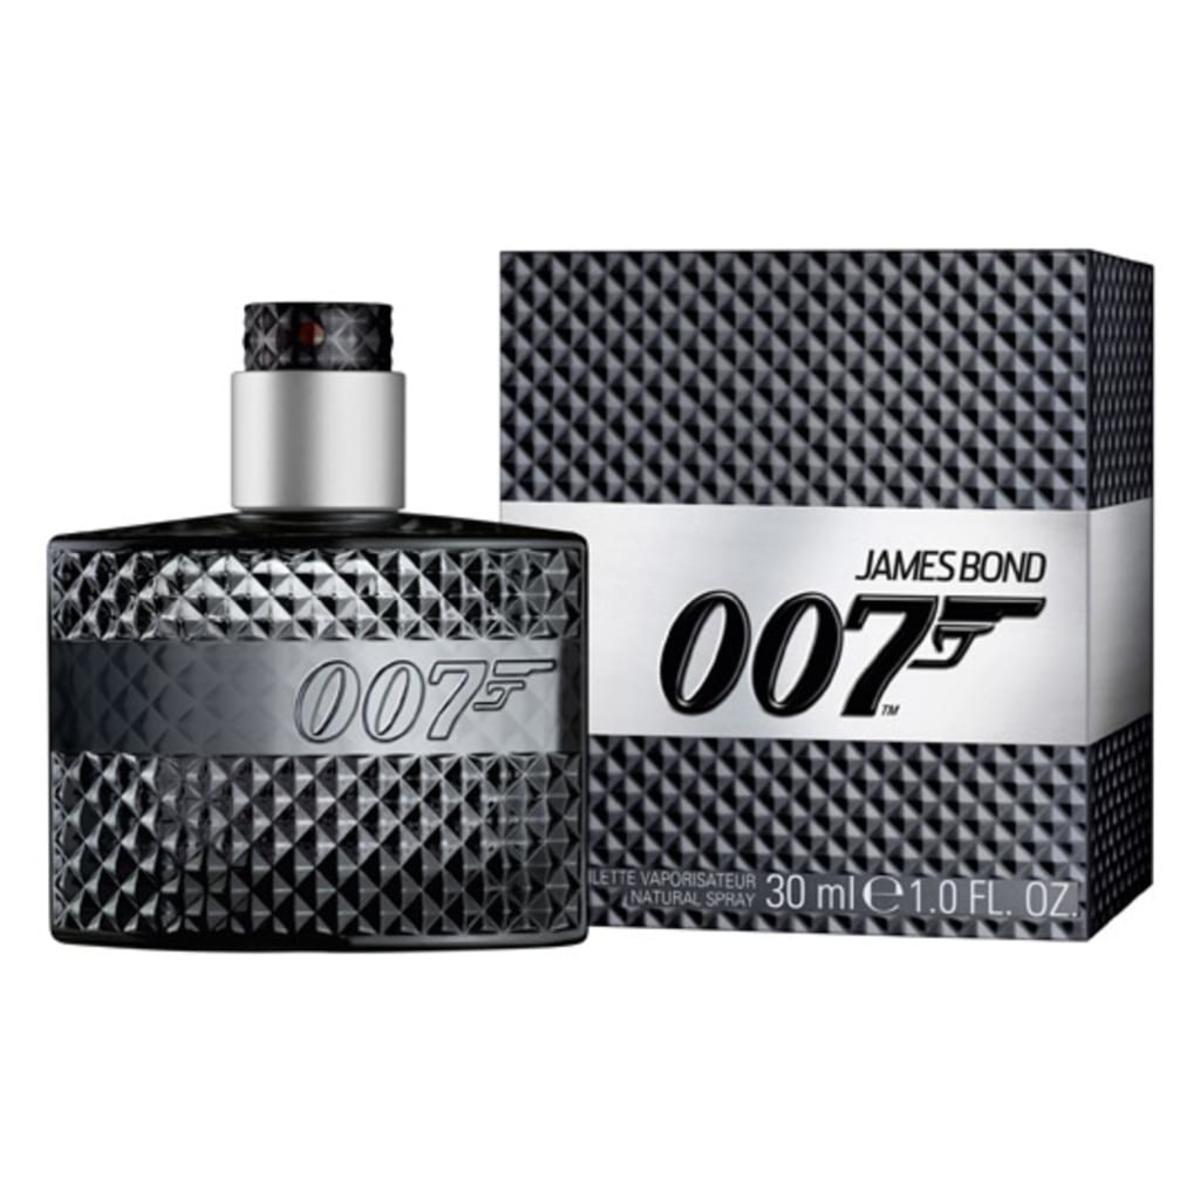 Bild 3 von James Bond 007 Eau de Toilette Spray 30 ml